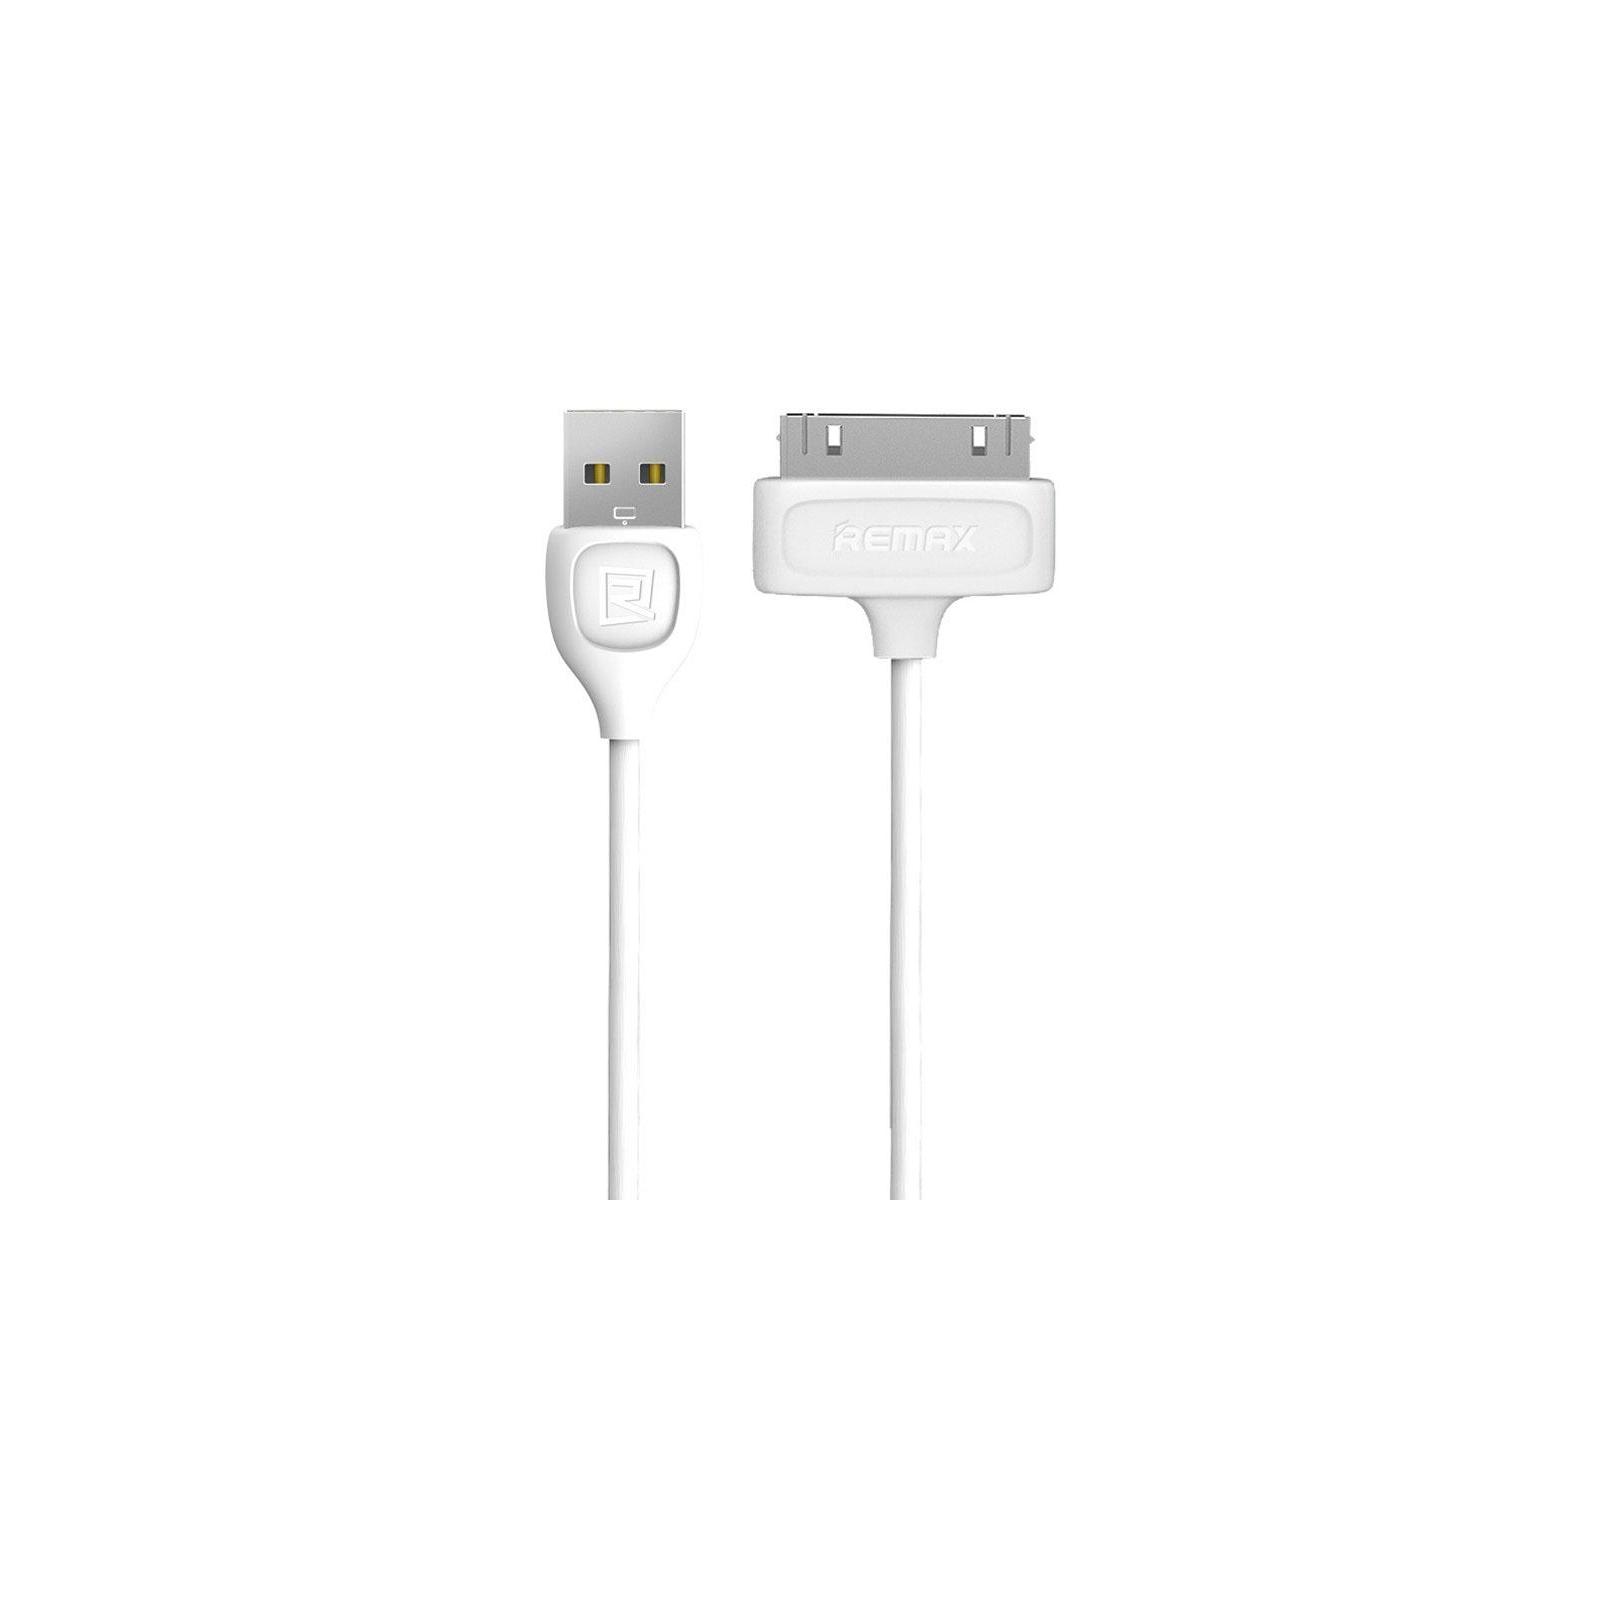 Дата кабель USB 2.0 AM to Apple 30pin 0.5m Lesu RC-050 White Remax (F_48634)